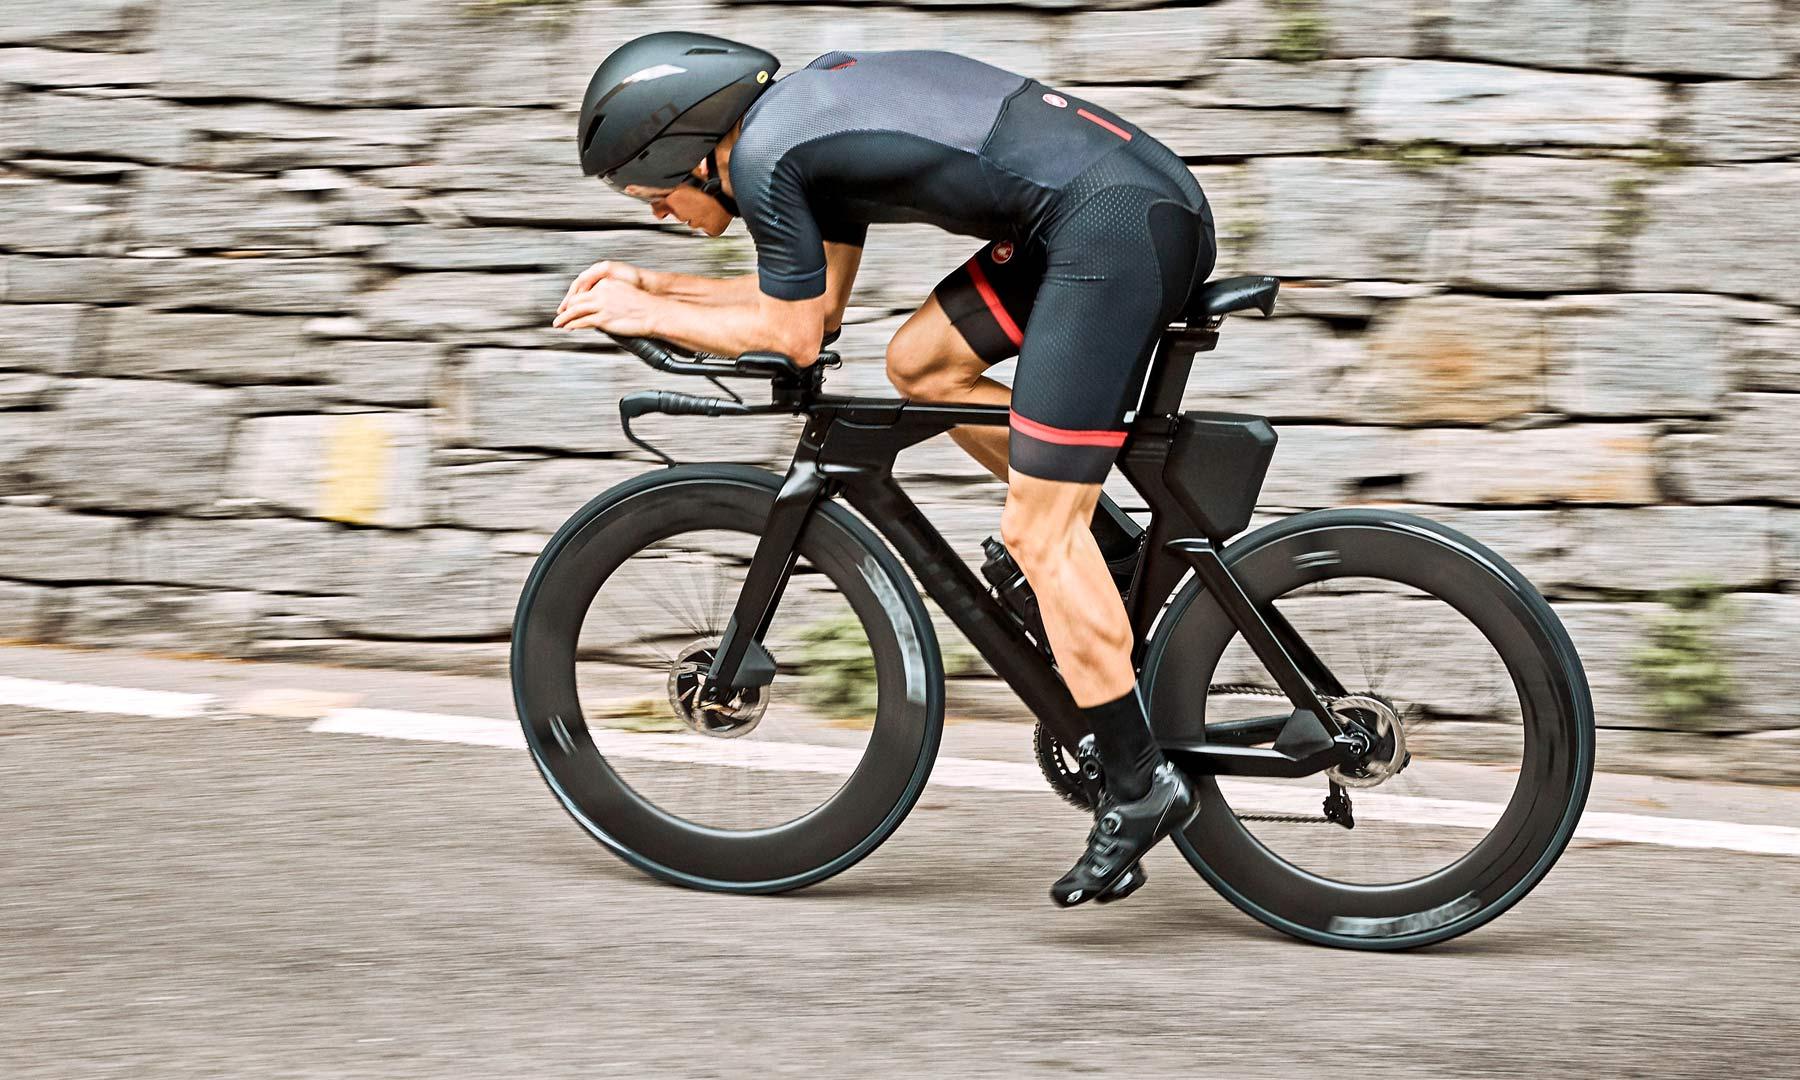 d3ea07164 BMC Timemachine 01 Disc slips in as the ultimate triathlon TT bike ...